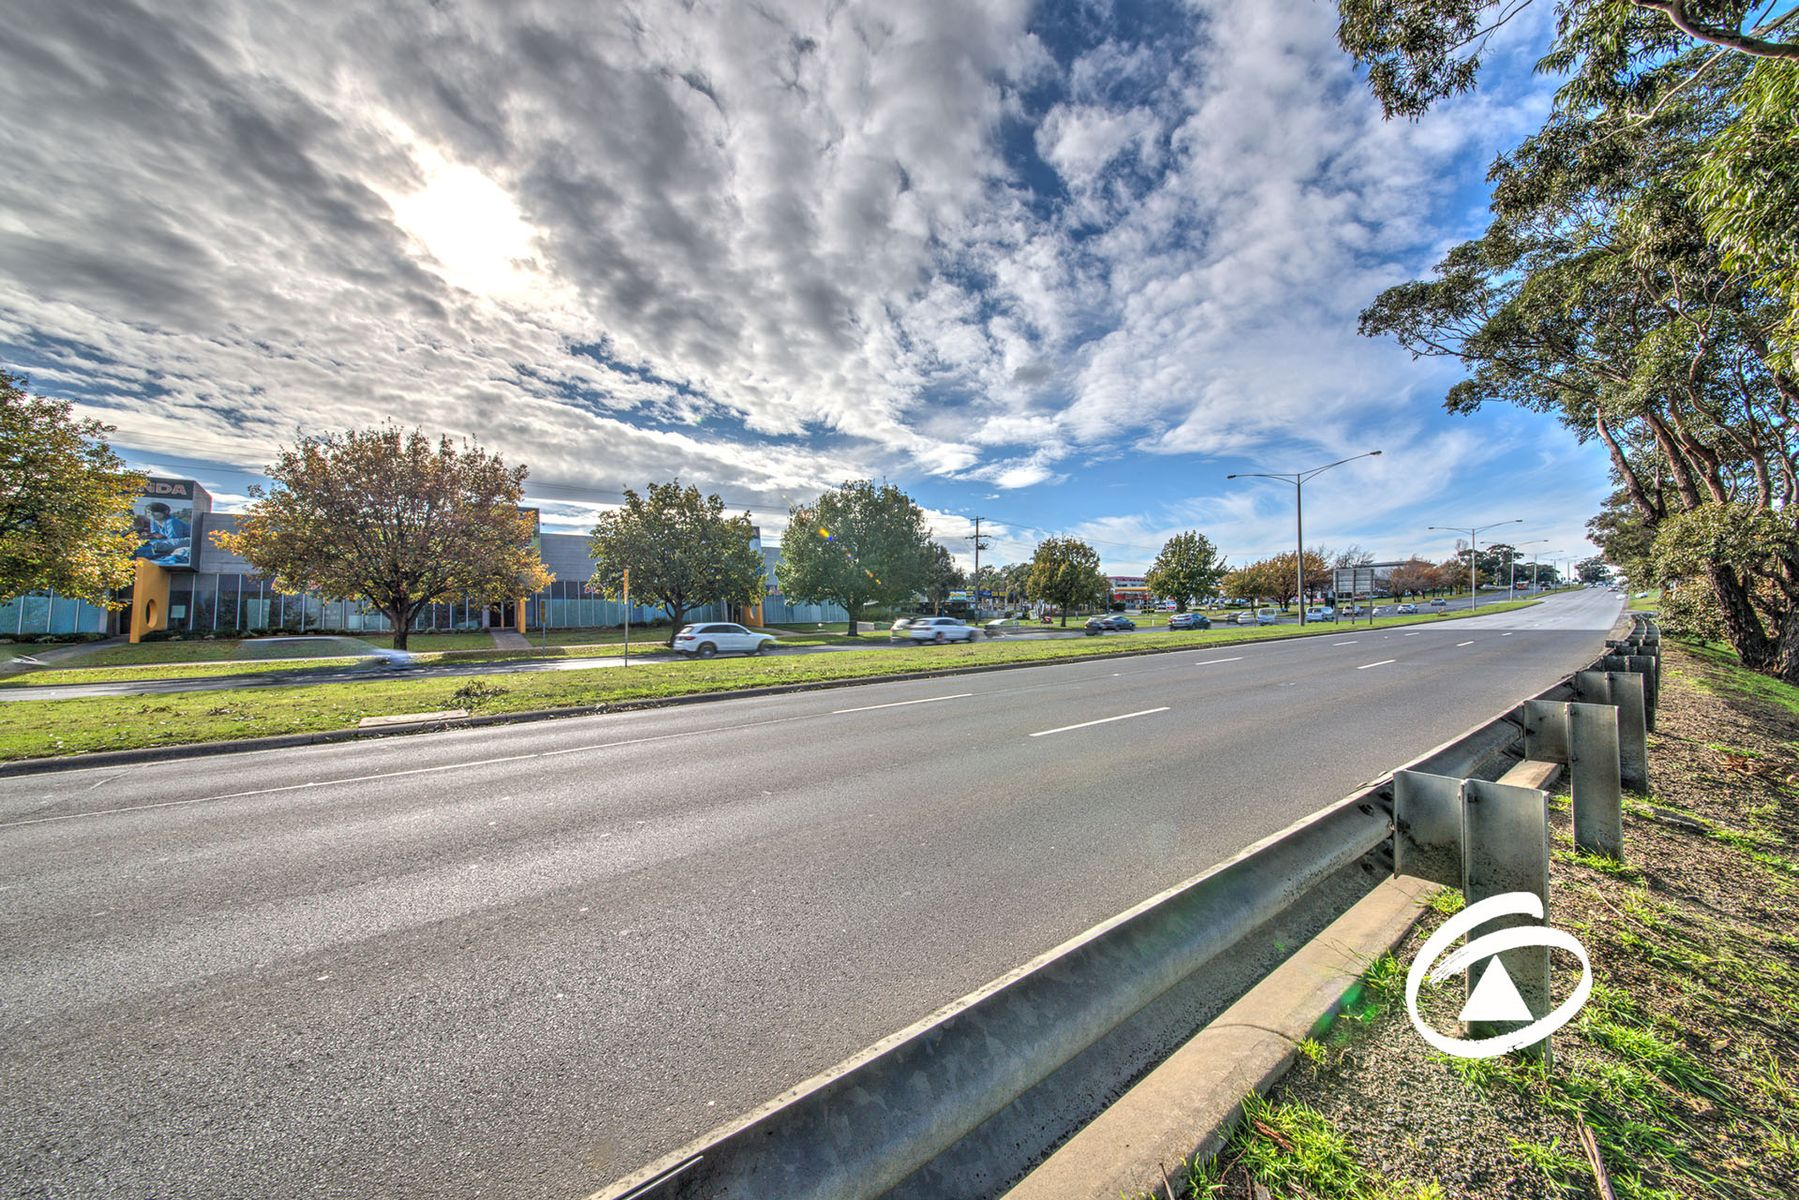 491 Princes Highway, Narre Warren, VIC 3805